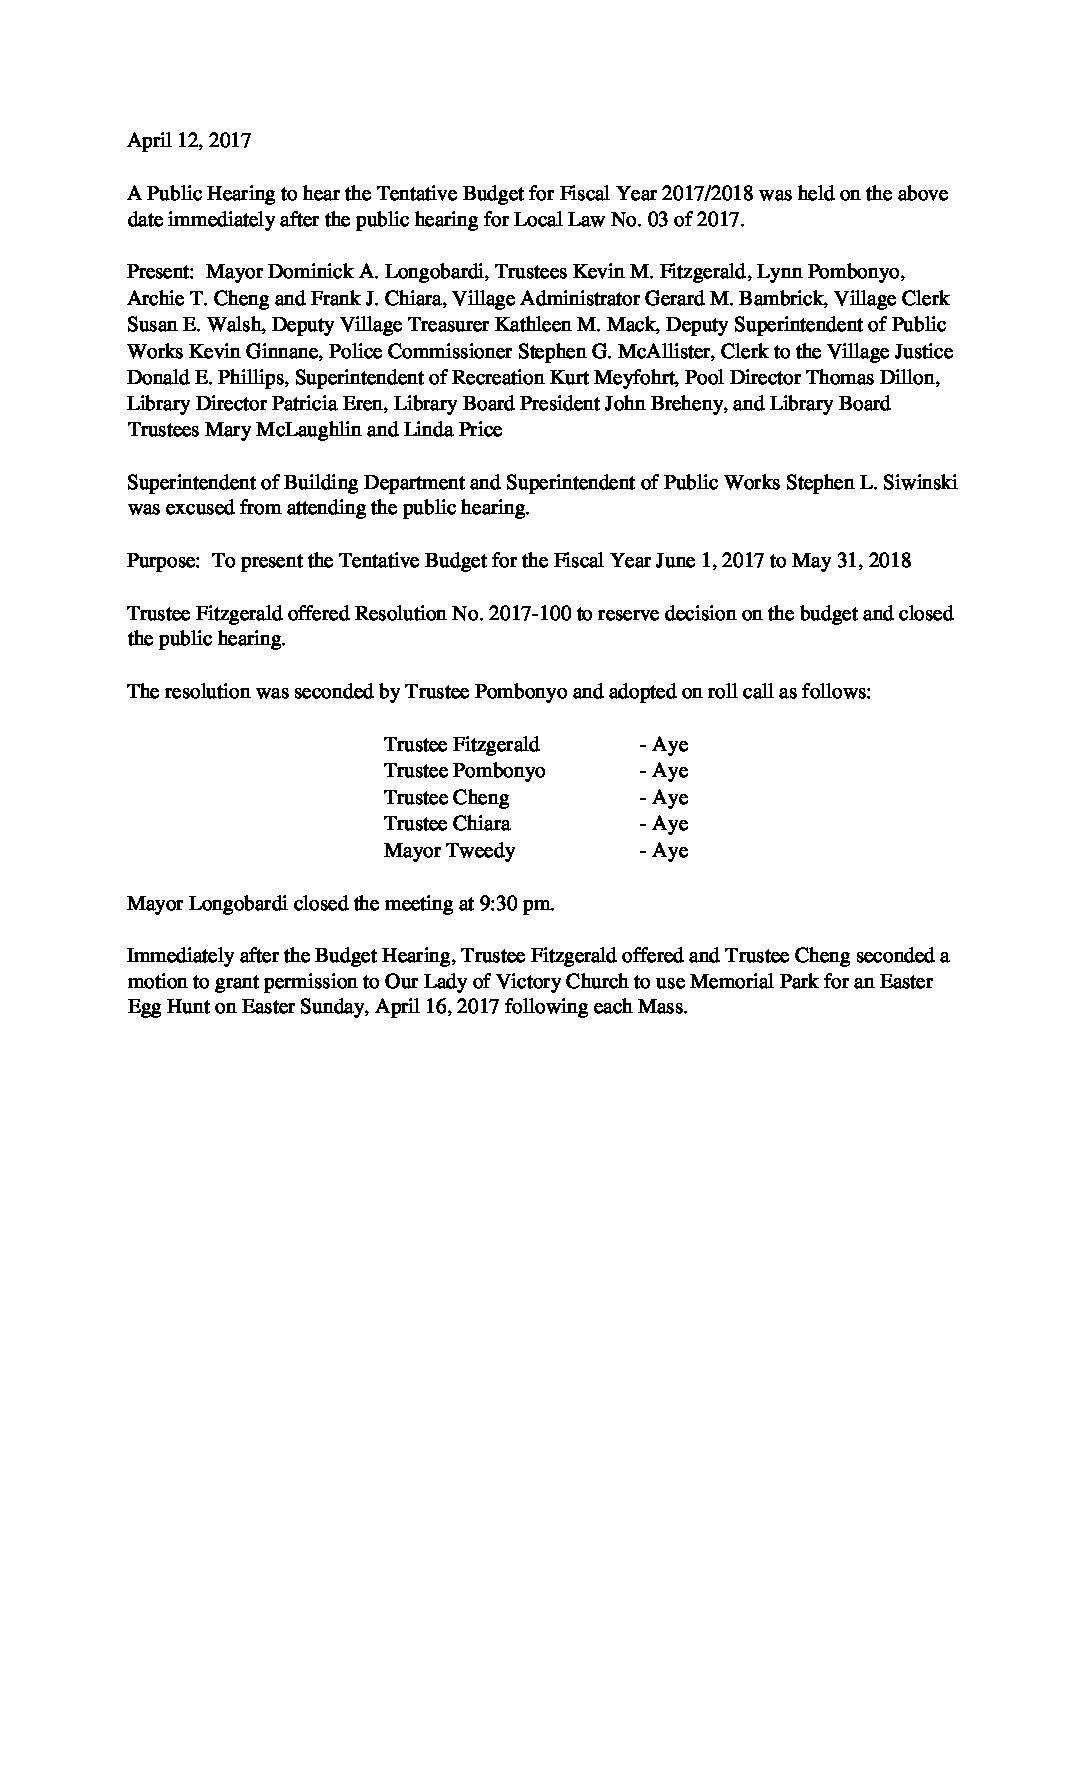 Minutes - 4-12-2017 Budget Hearing